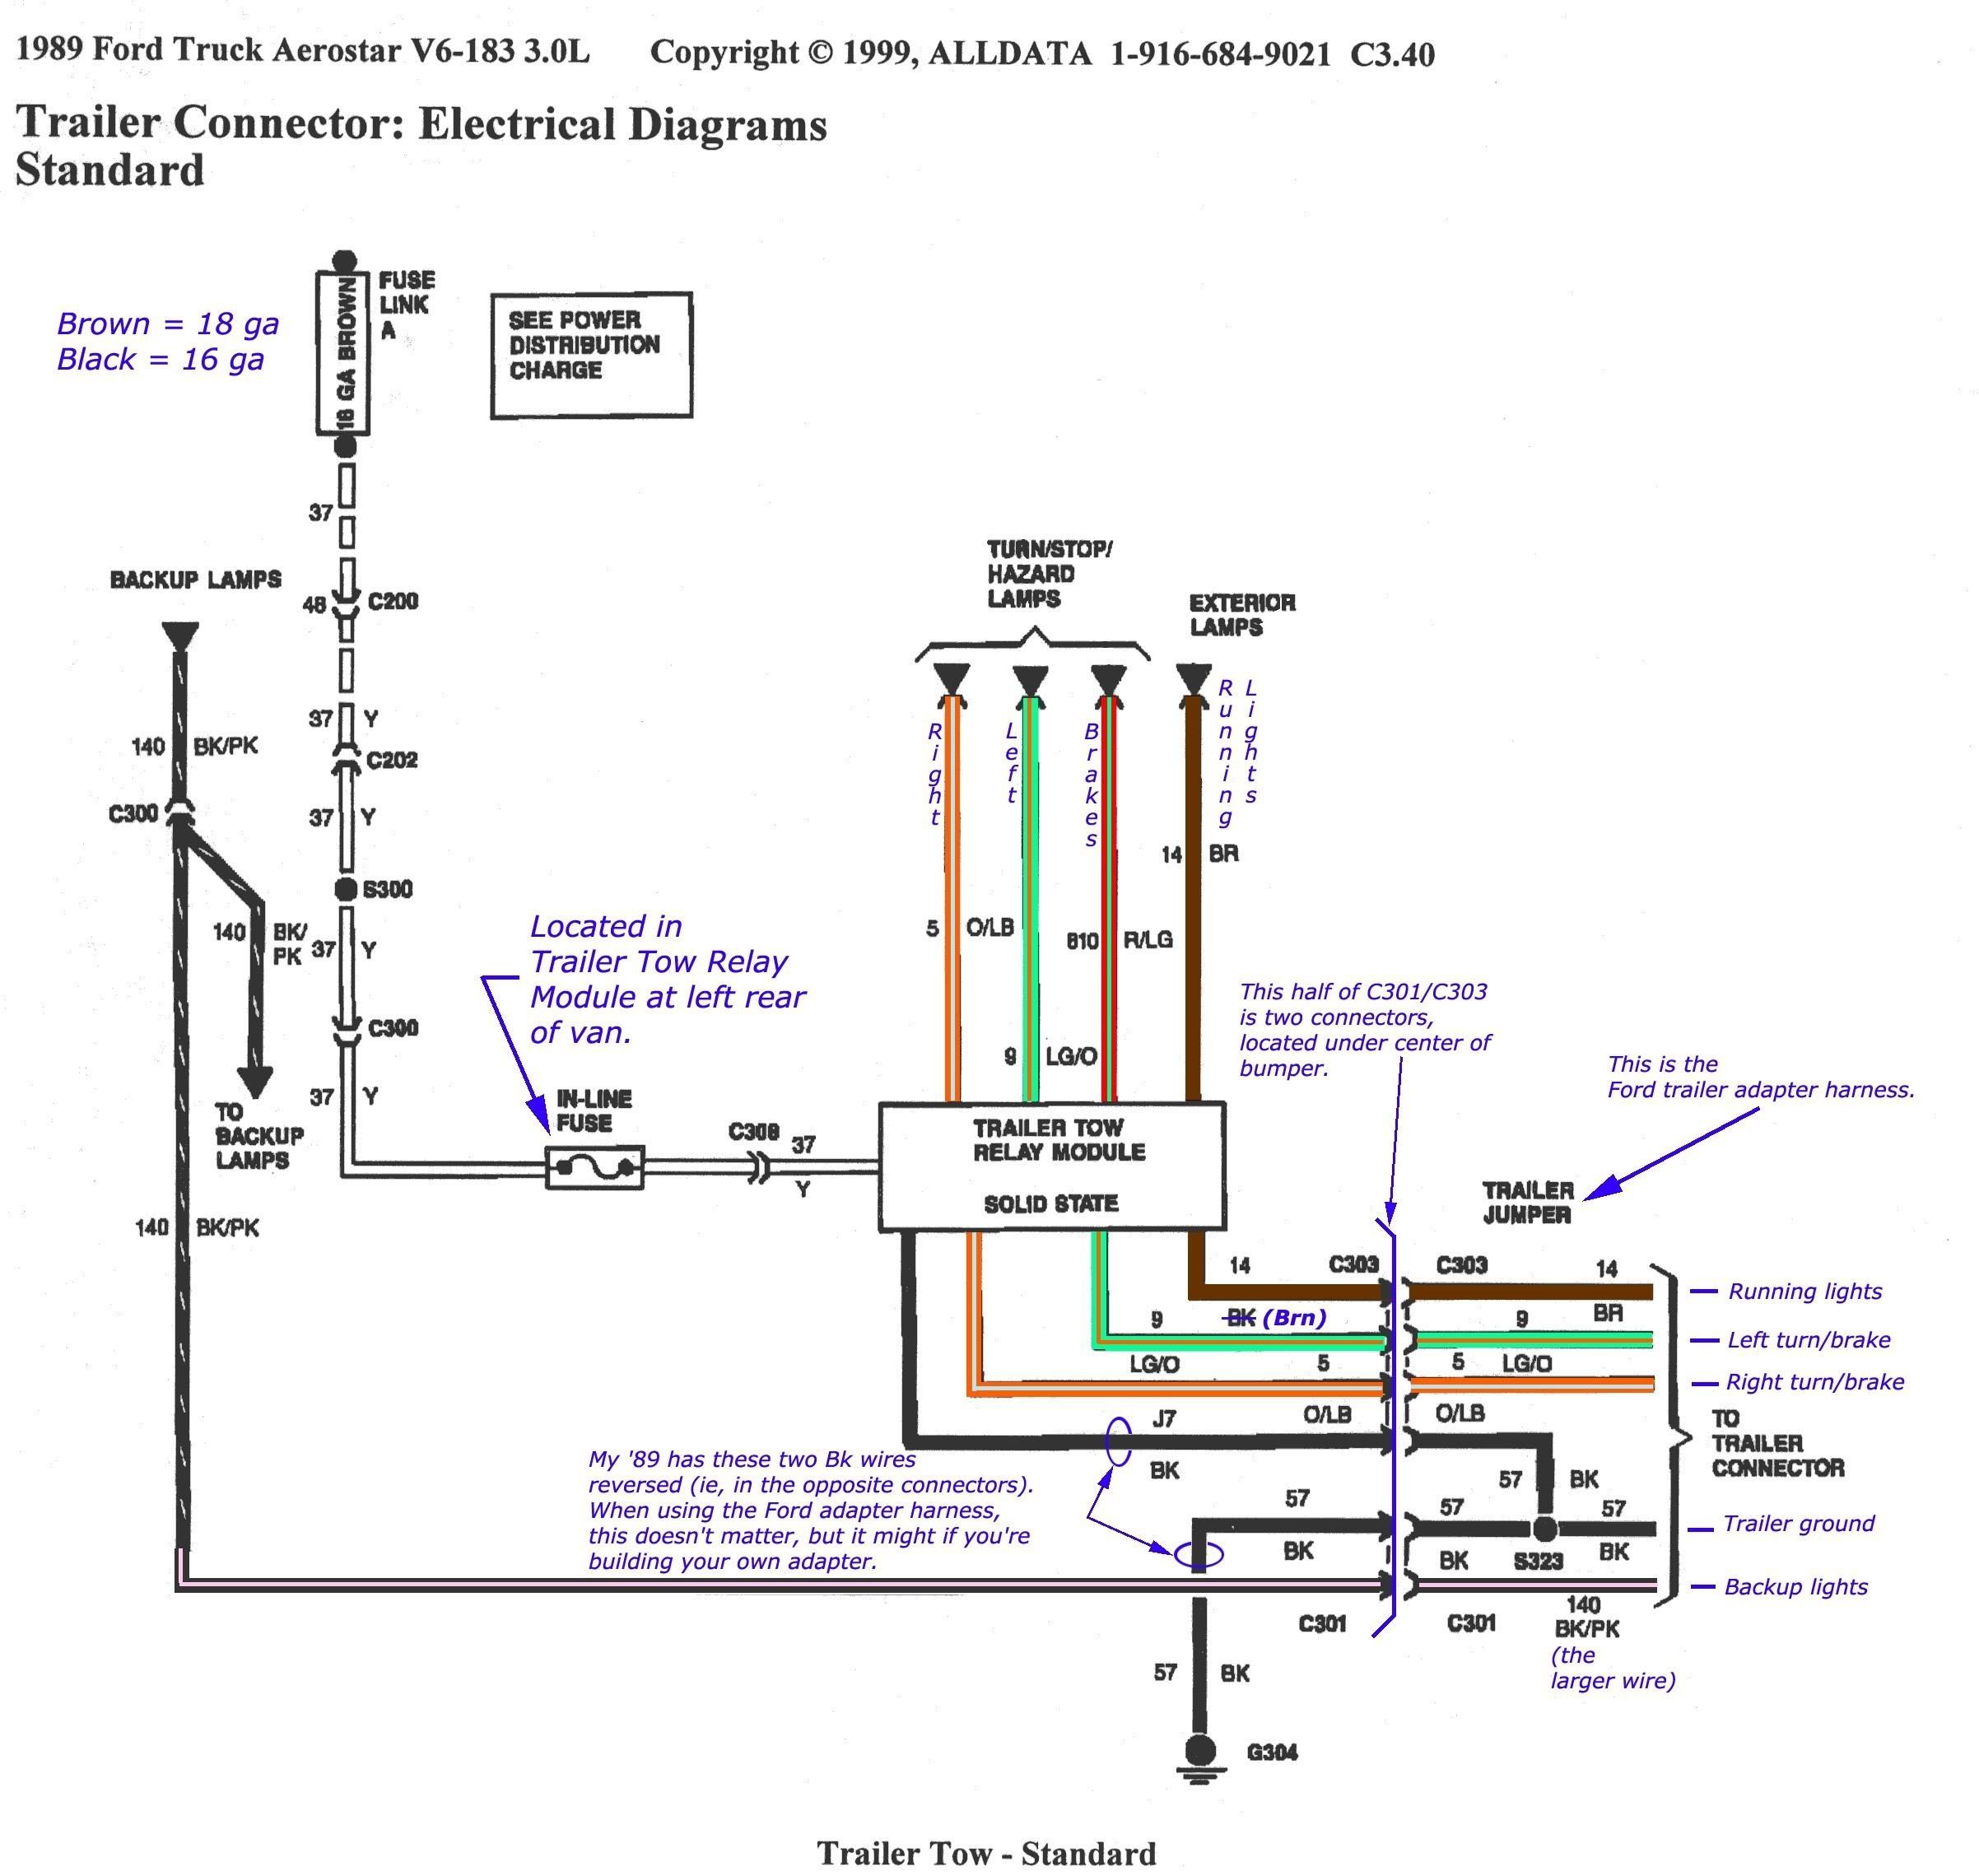 car trailer plug wiring diagram dodge ram 2500 trailer plug wiring rh detoxicrecenze com Utility Trailer Wiring Diagram 5 Wire Trailer Wiring Diagram